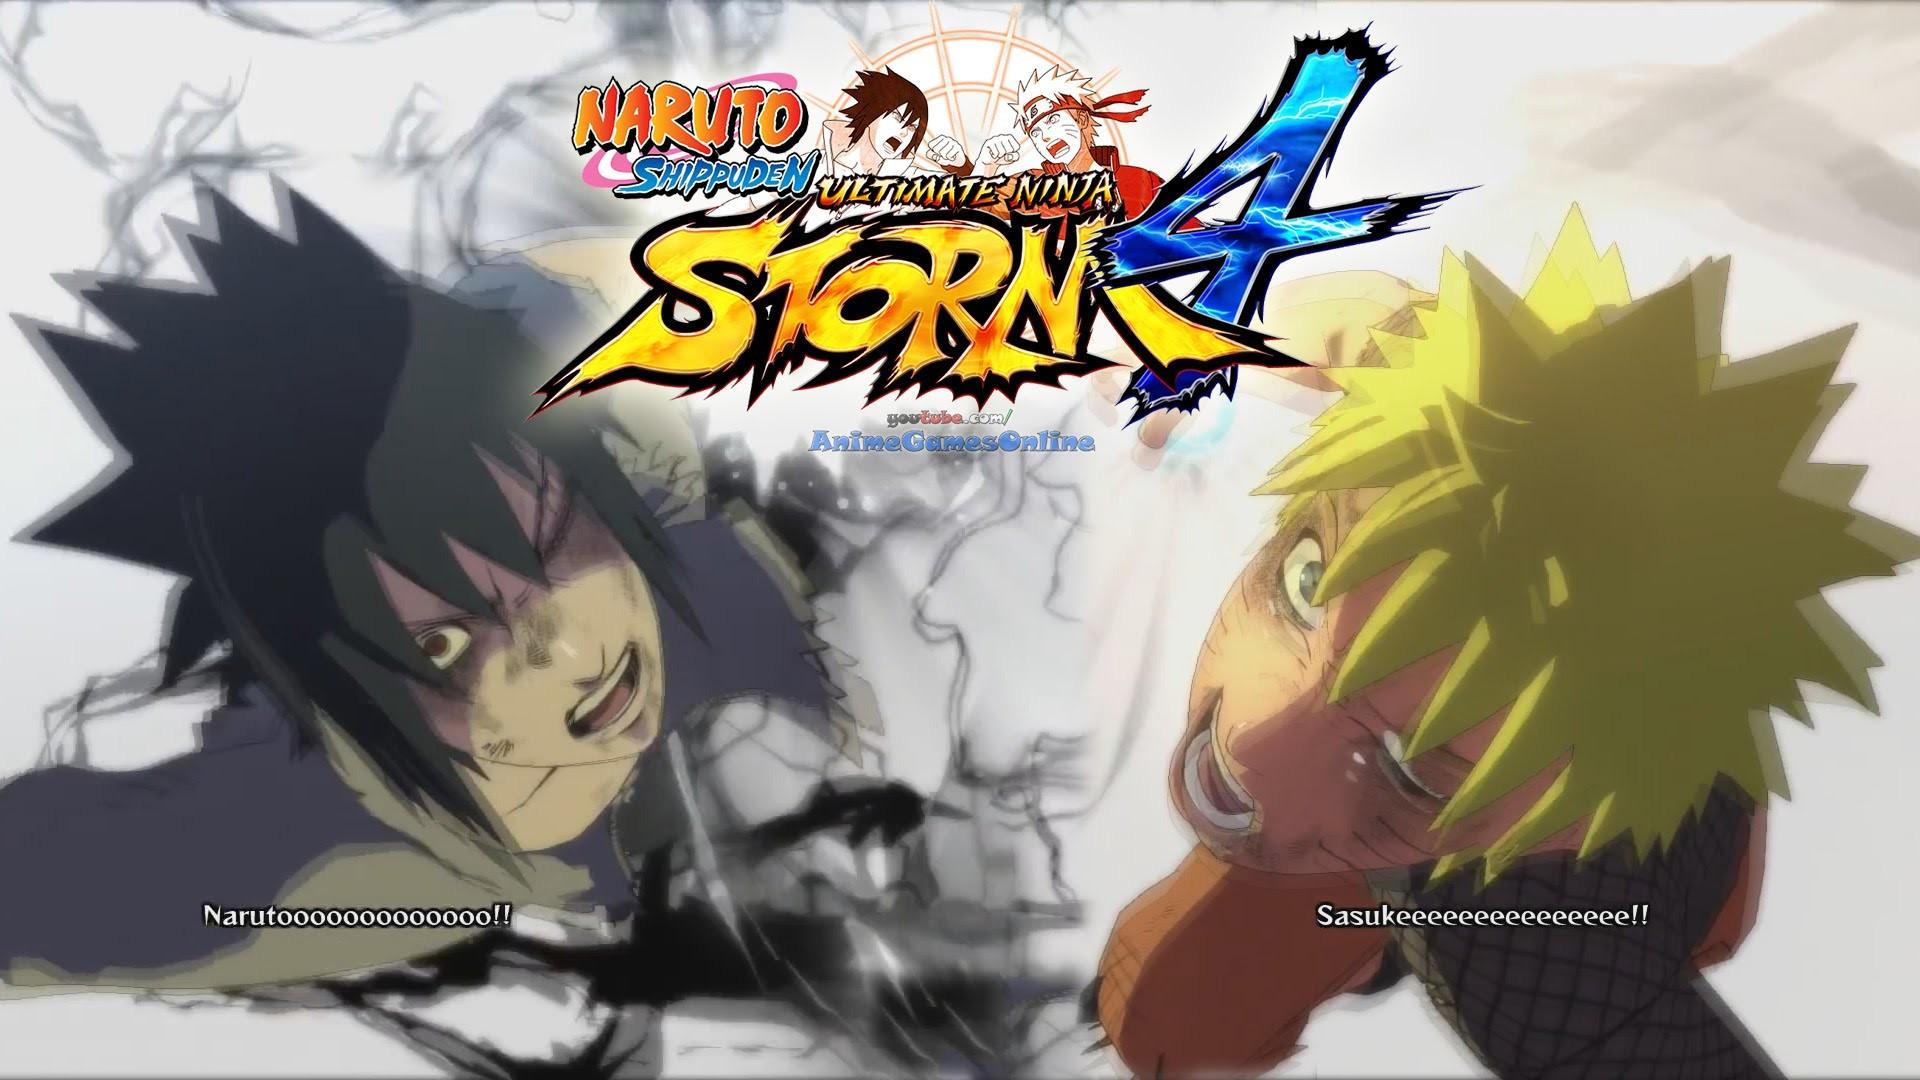 Download Wallpaper Naruto Original - 762893-full-size-naruto-vs-sasuke-wallpaper-1920x1080-for-iphone-5  Gallery_248127.jpg